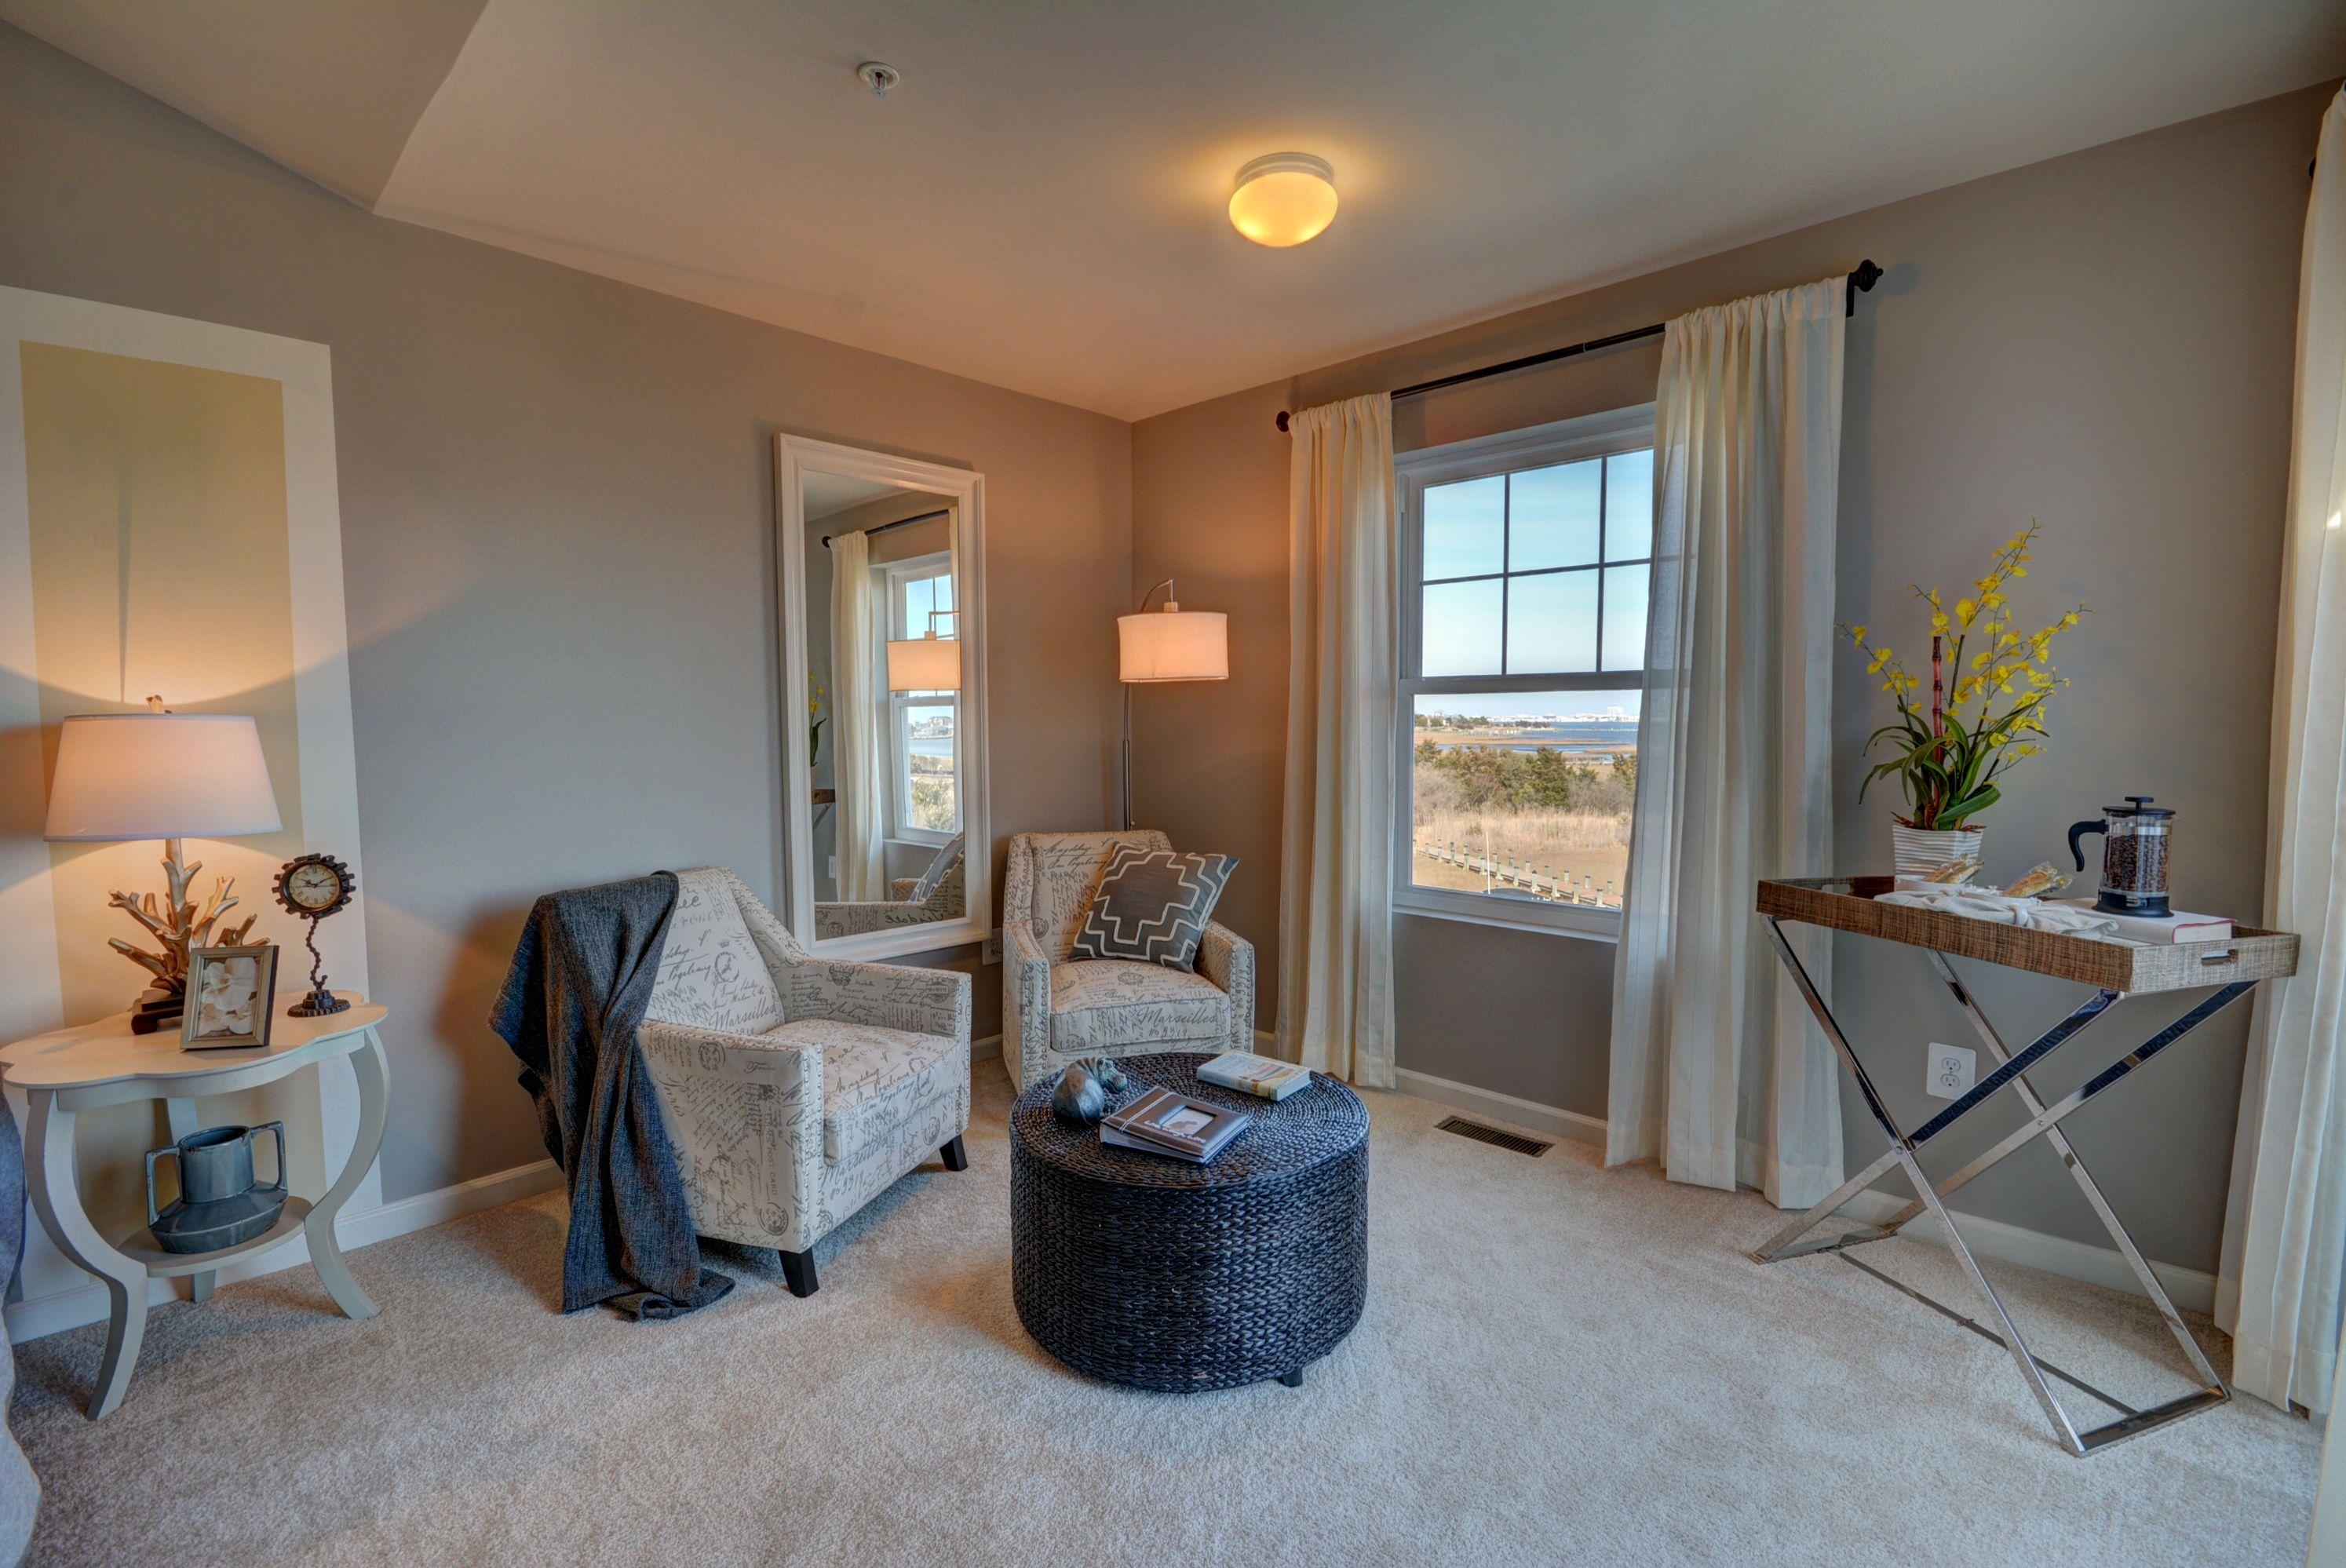 Sitting room in the master bedroom at Seaside Village